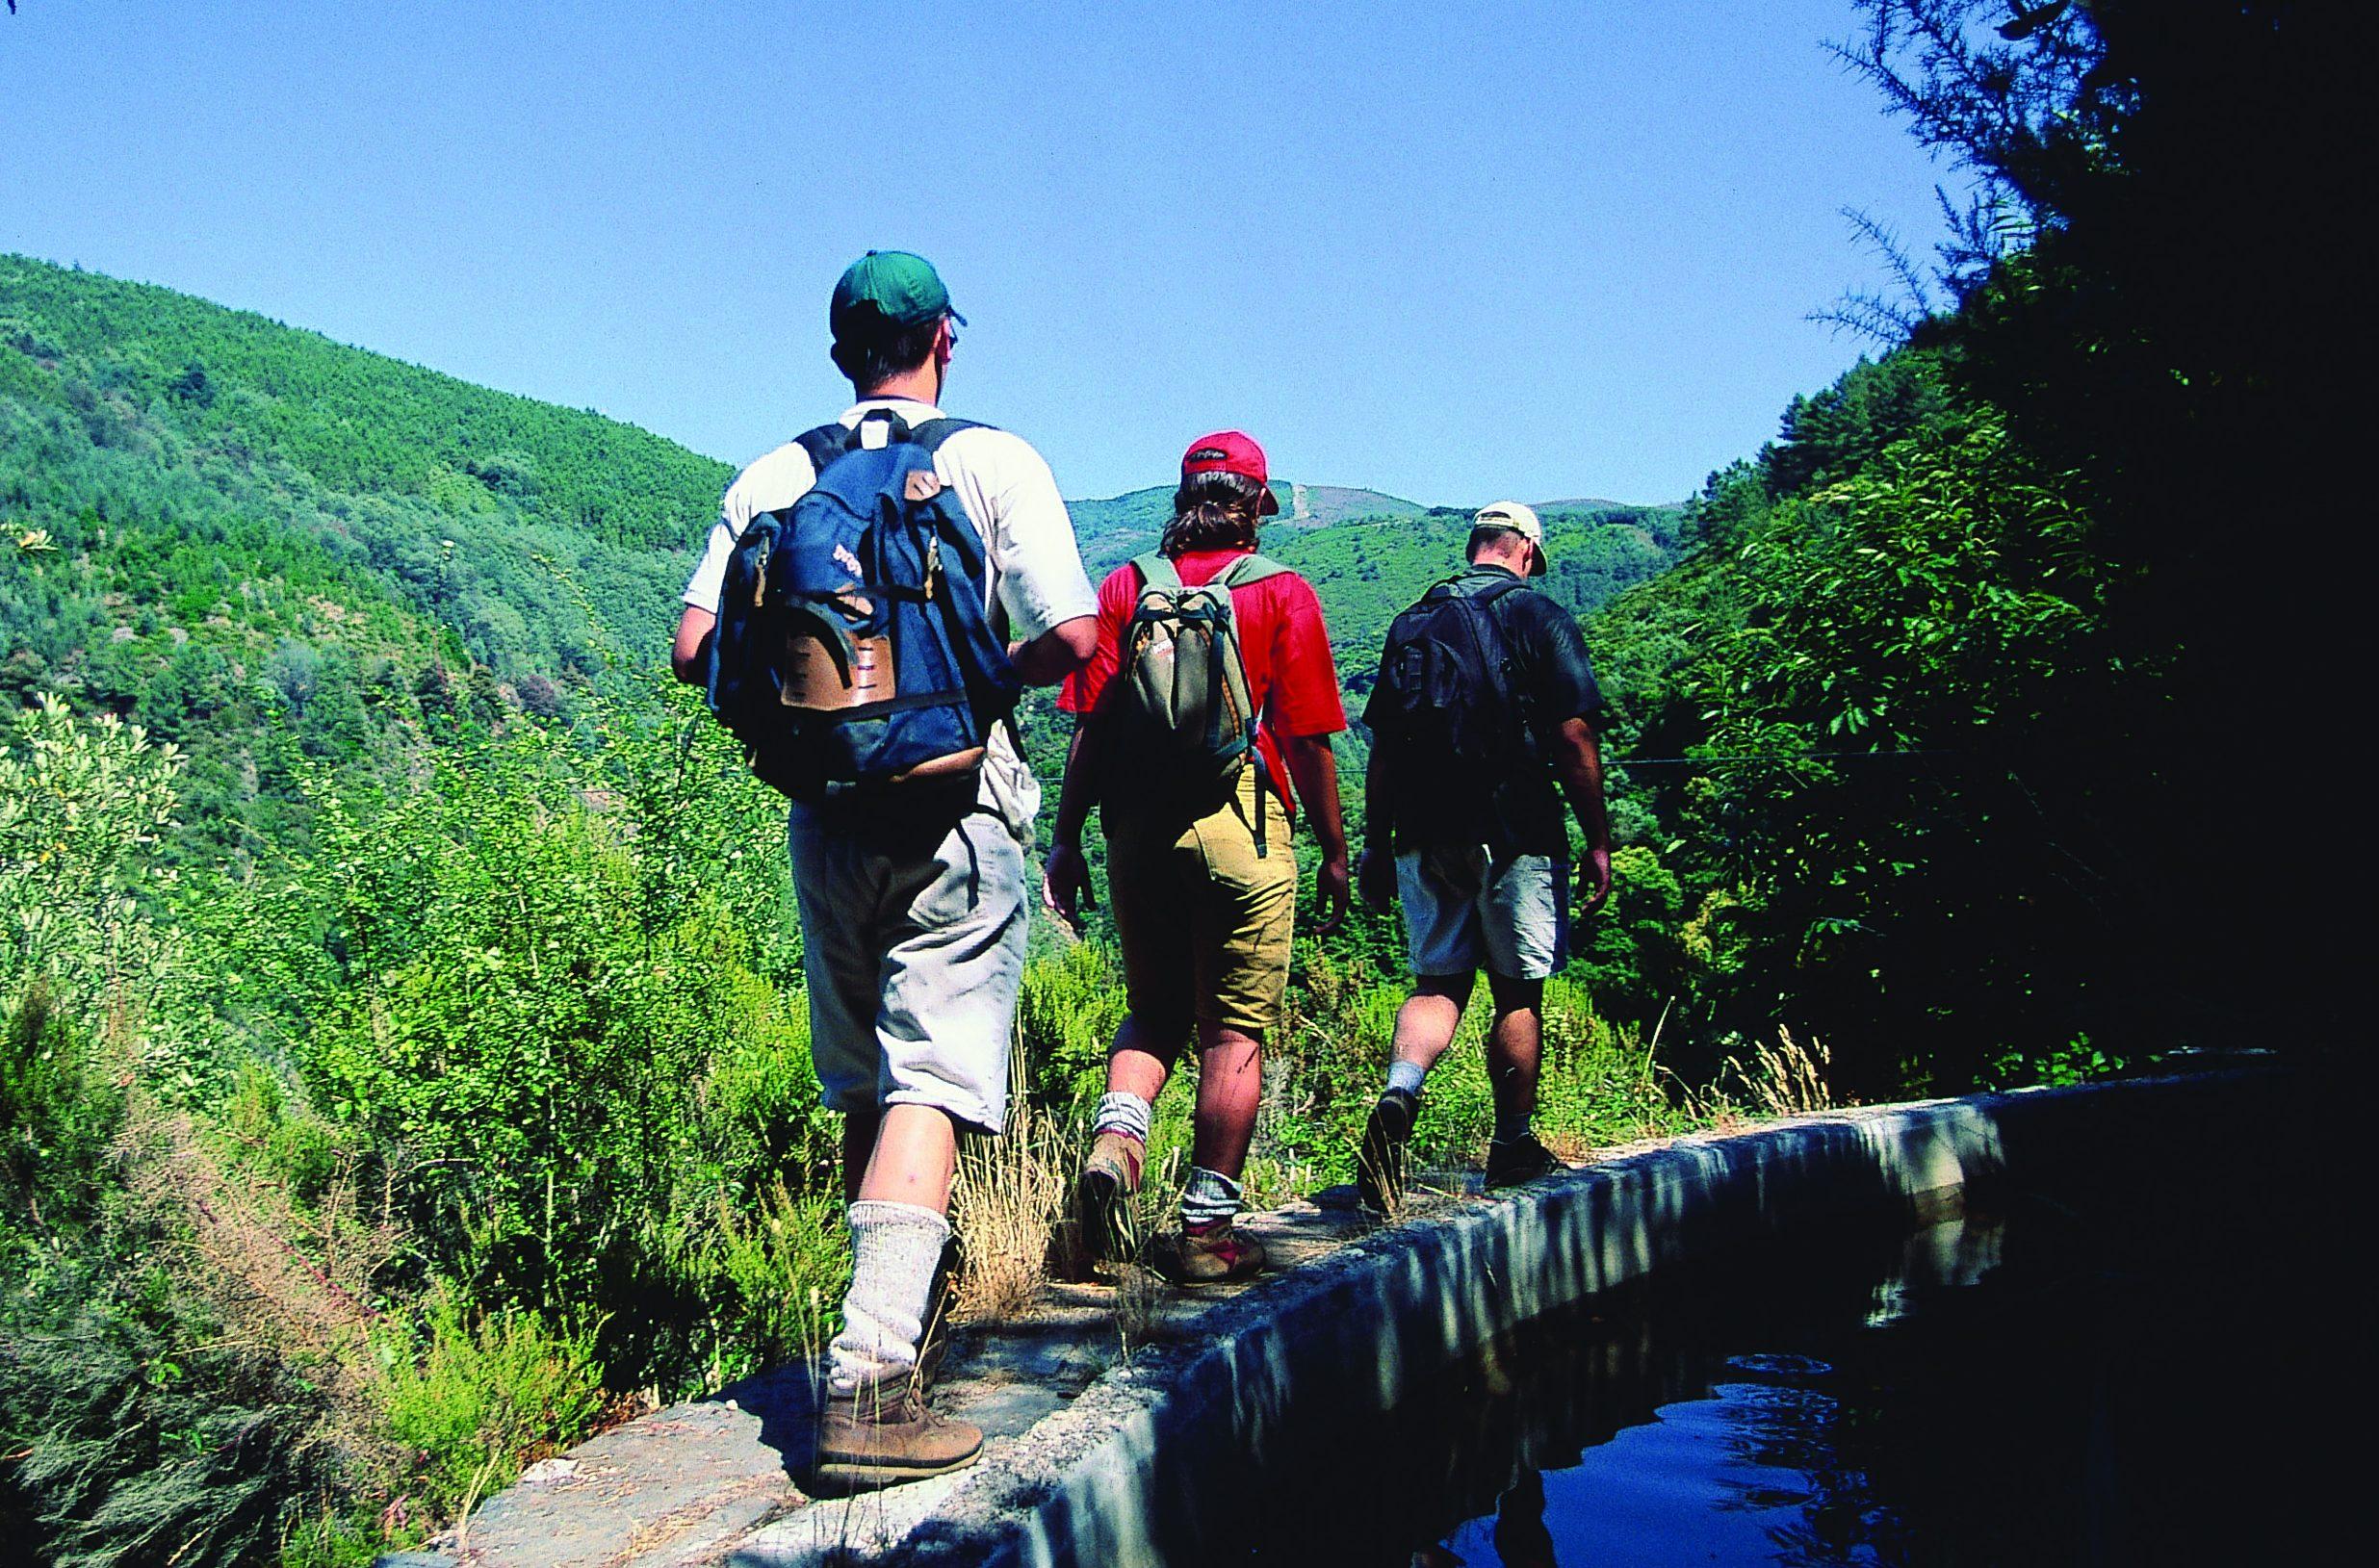 Vandreture er populært hos mange rejsende – her er det trekking i portugisiske Serra da Lousa, cirka midtvejs mellem Porto og Lissabon. Pressefoto fra Turismo de Portugal, Paulo Magalhaes.